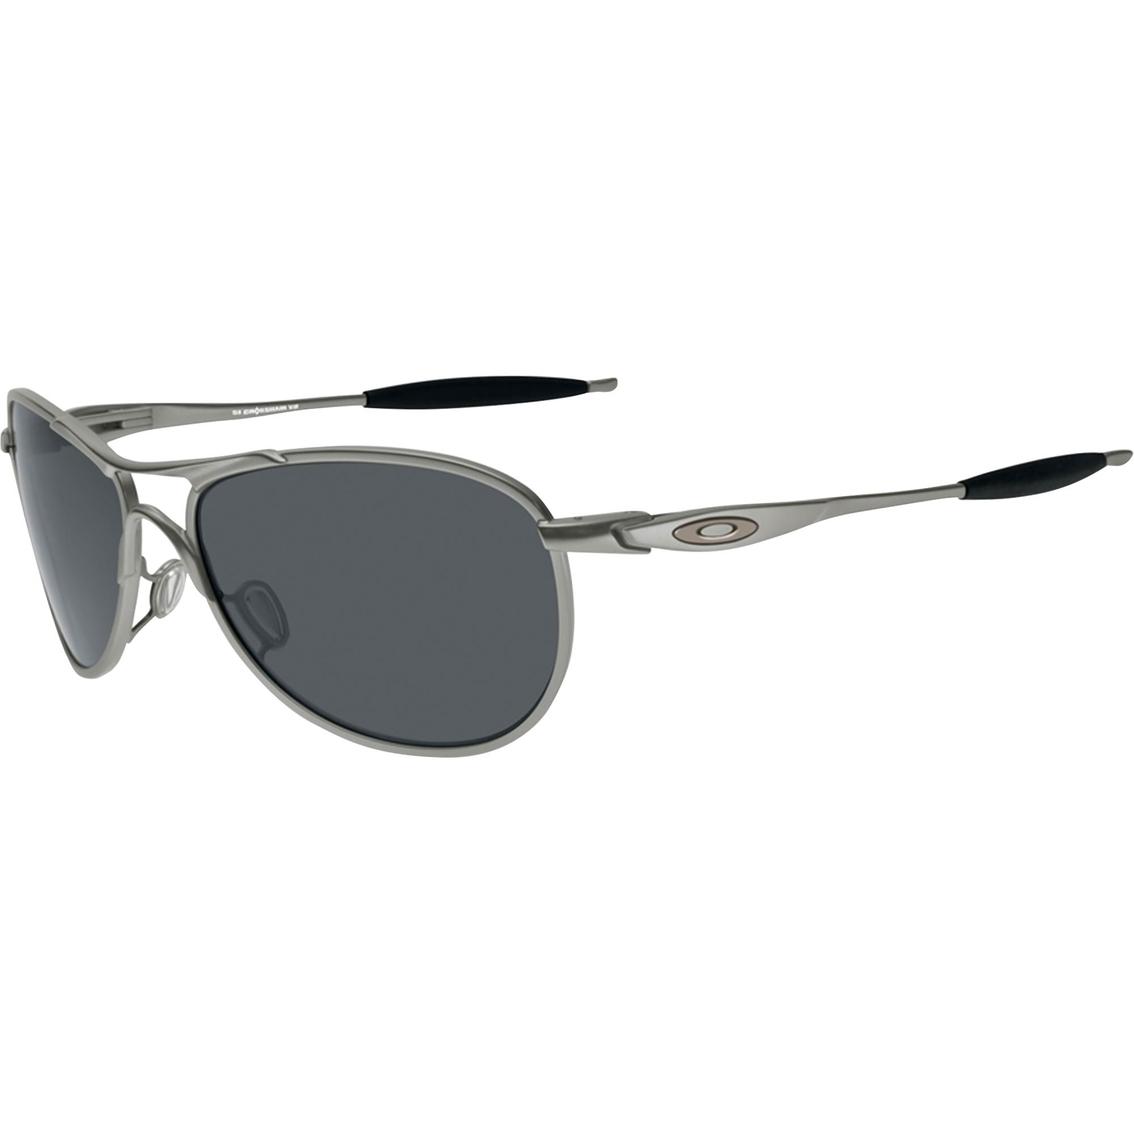 cca17fe70d8 Oakley Si Ballistic Crosshair Sunglasses